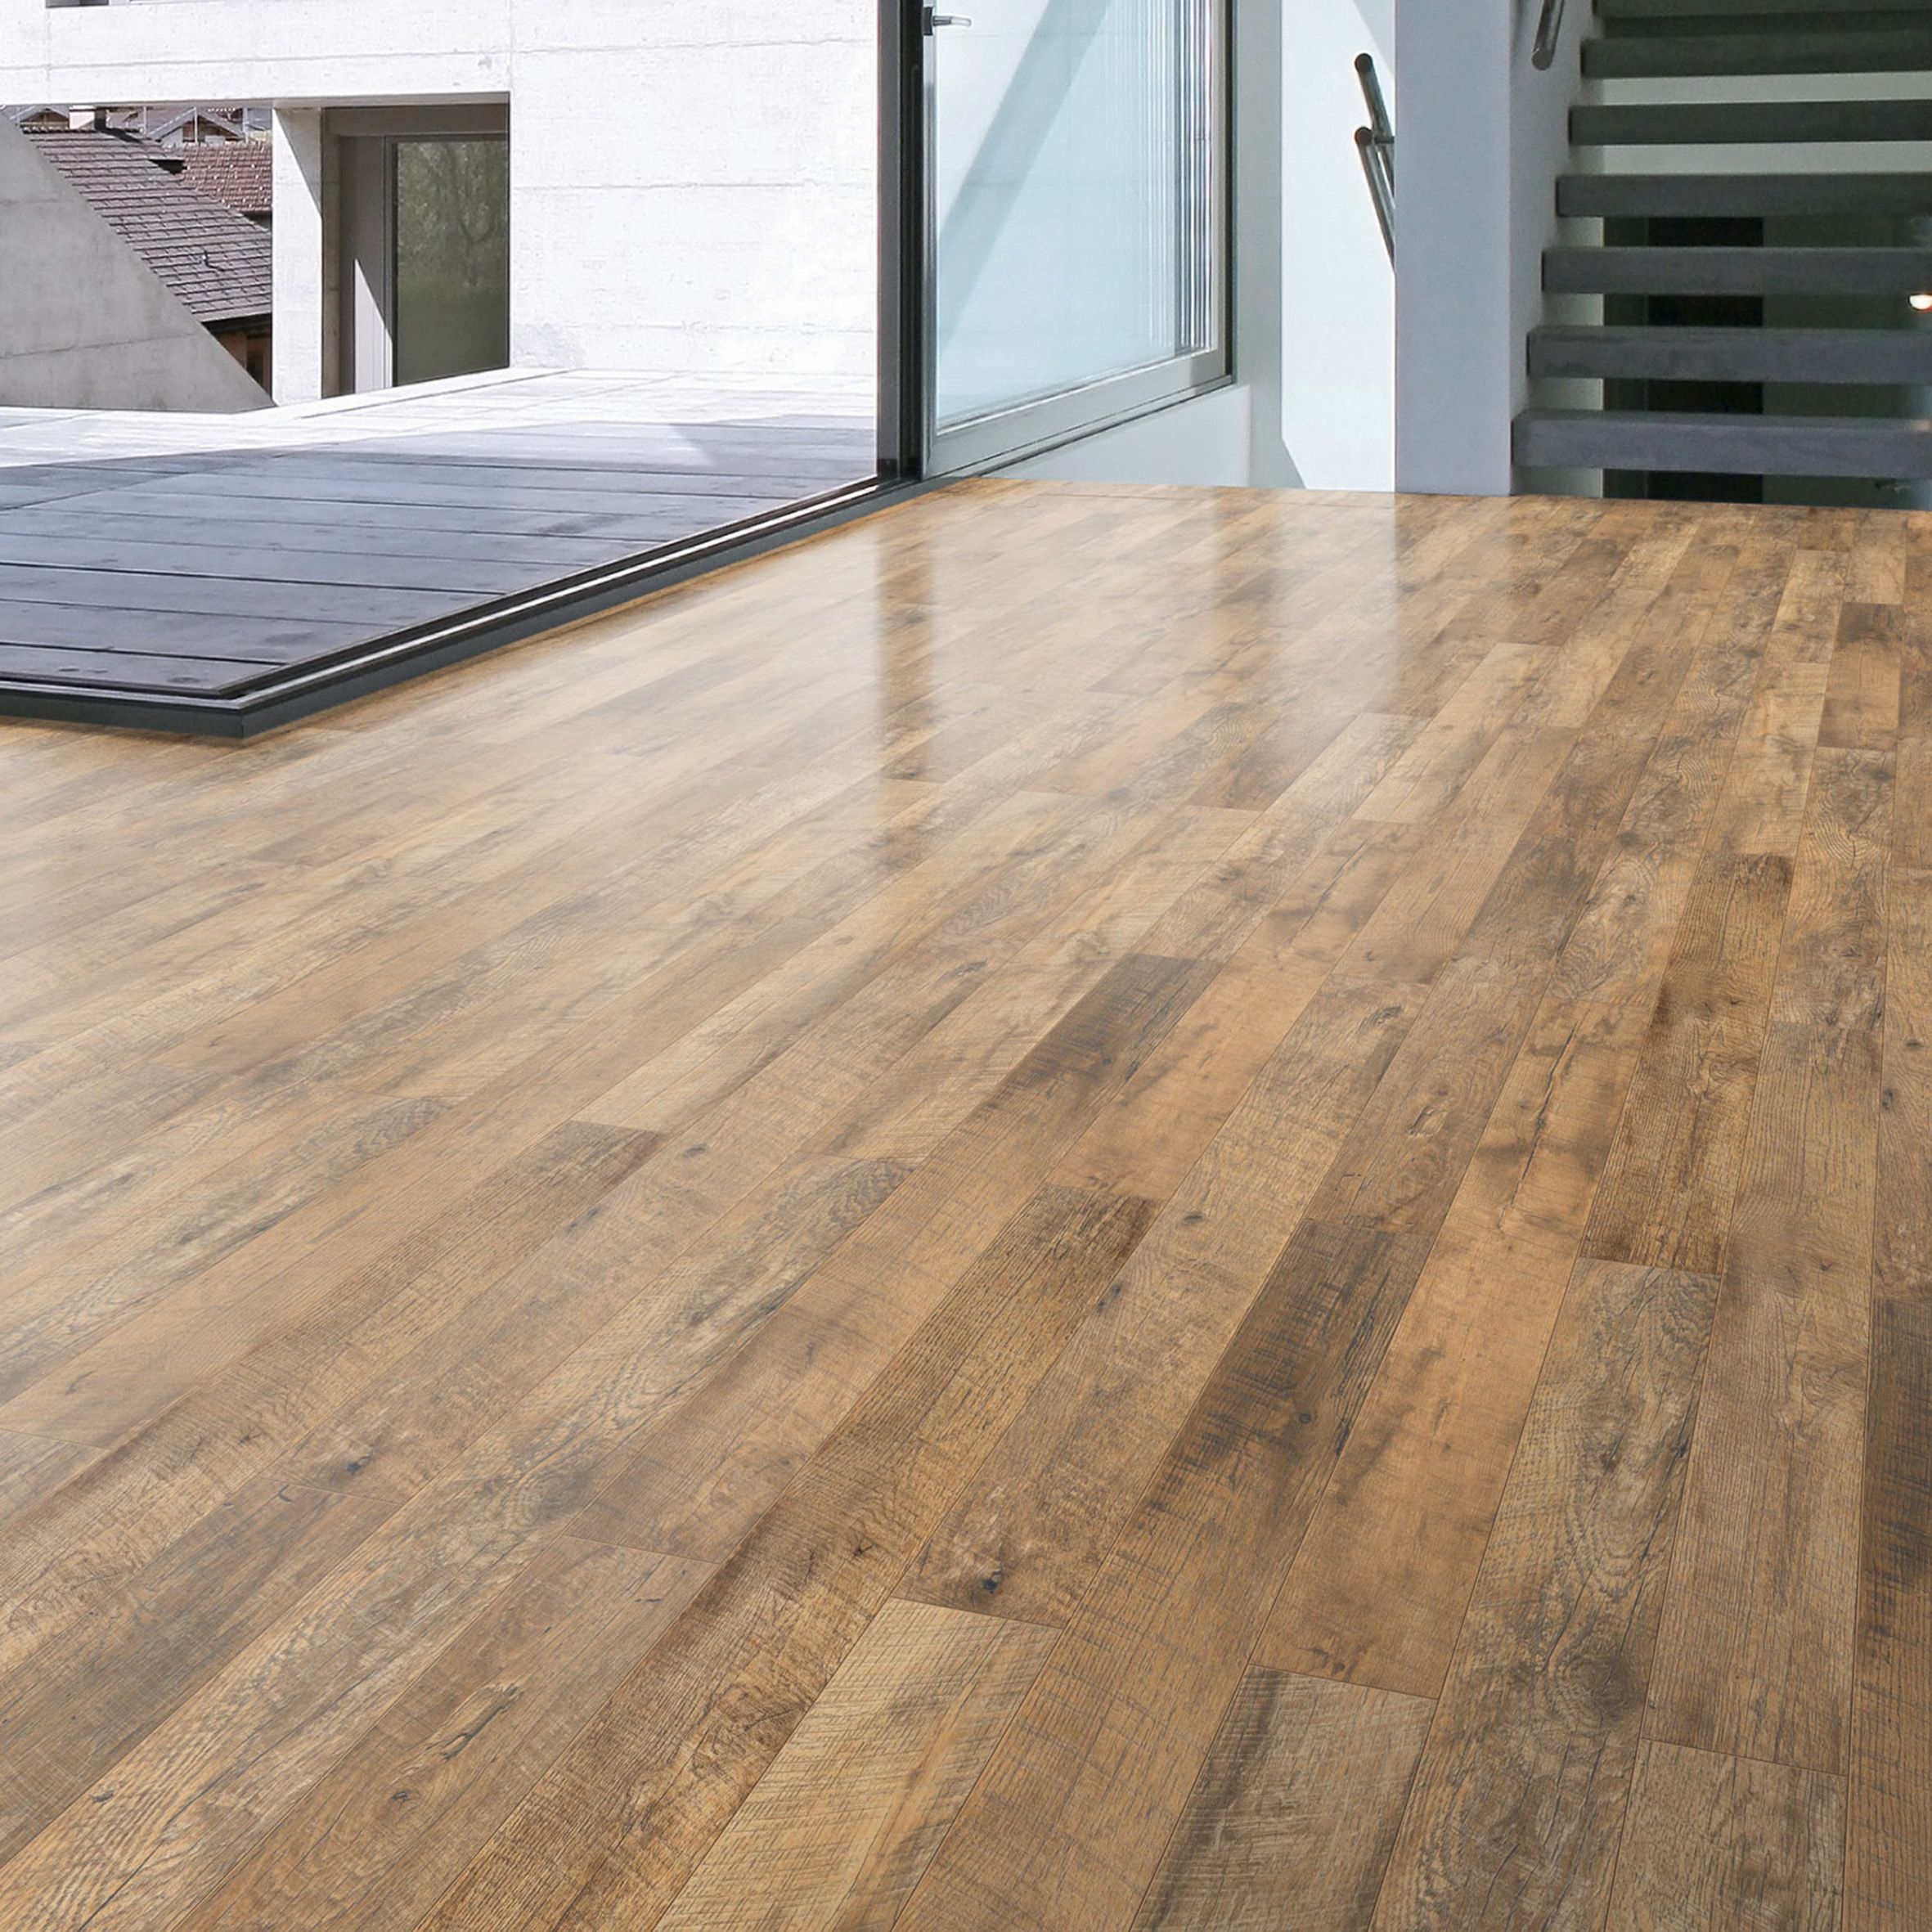 Oak laminate flooring guarcino reclaimed oak effect laminate flooring 1.64 m² pack | departments  | XBJSSVA